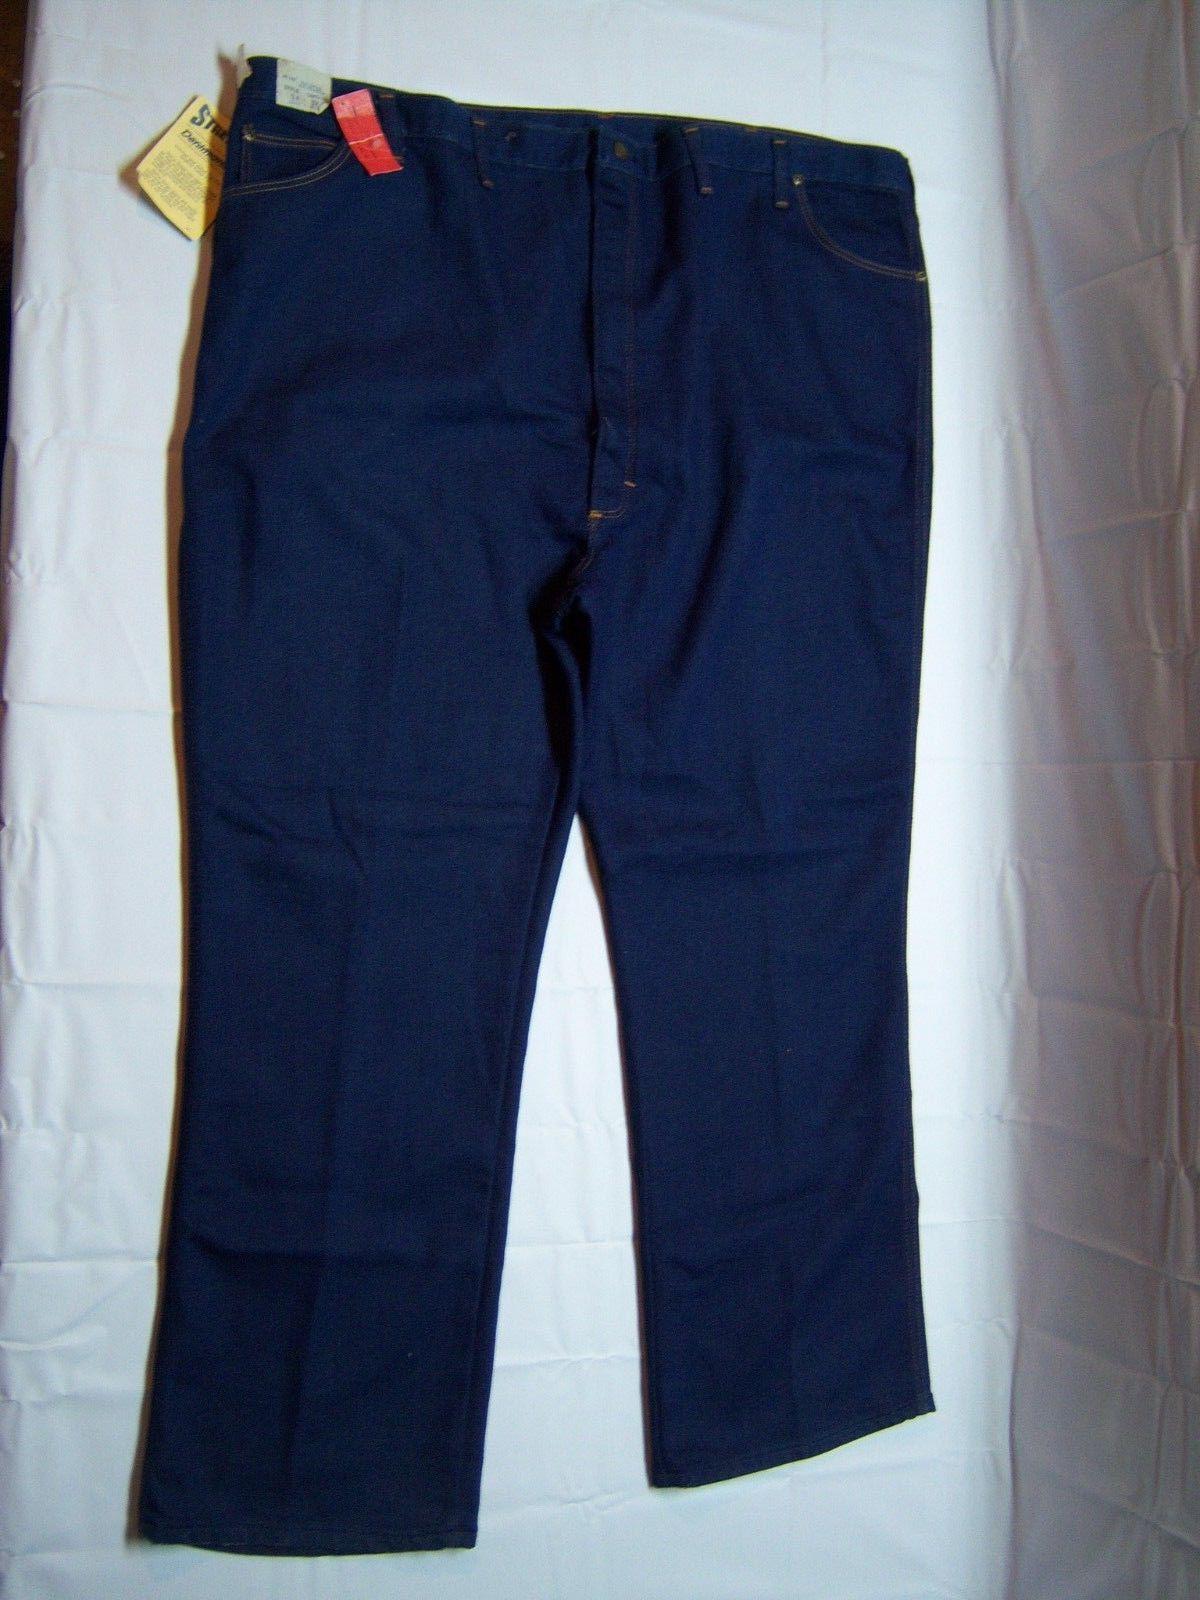 RARE Vintage Sierra Ridge Men's Jeans Size 54x32 NWT